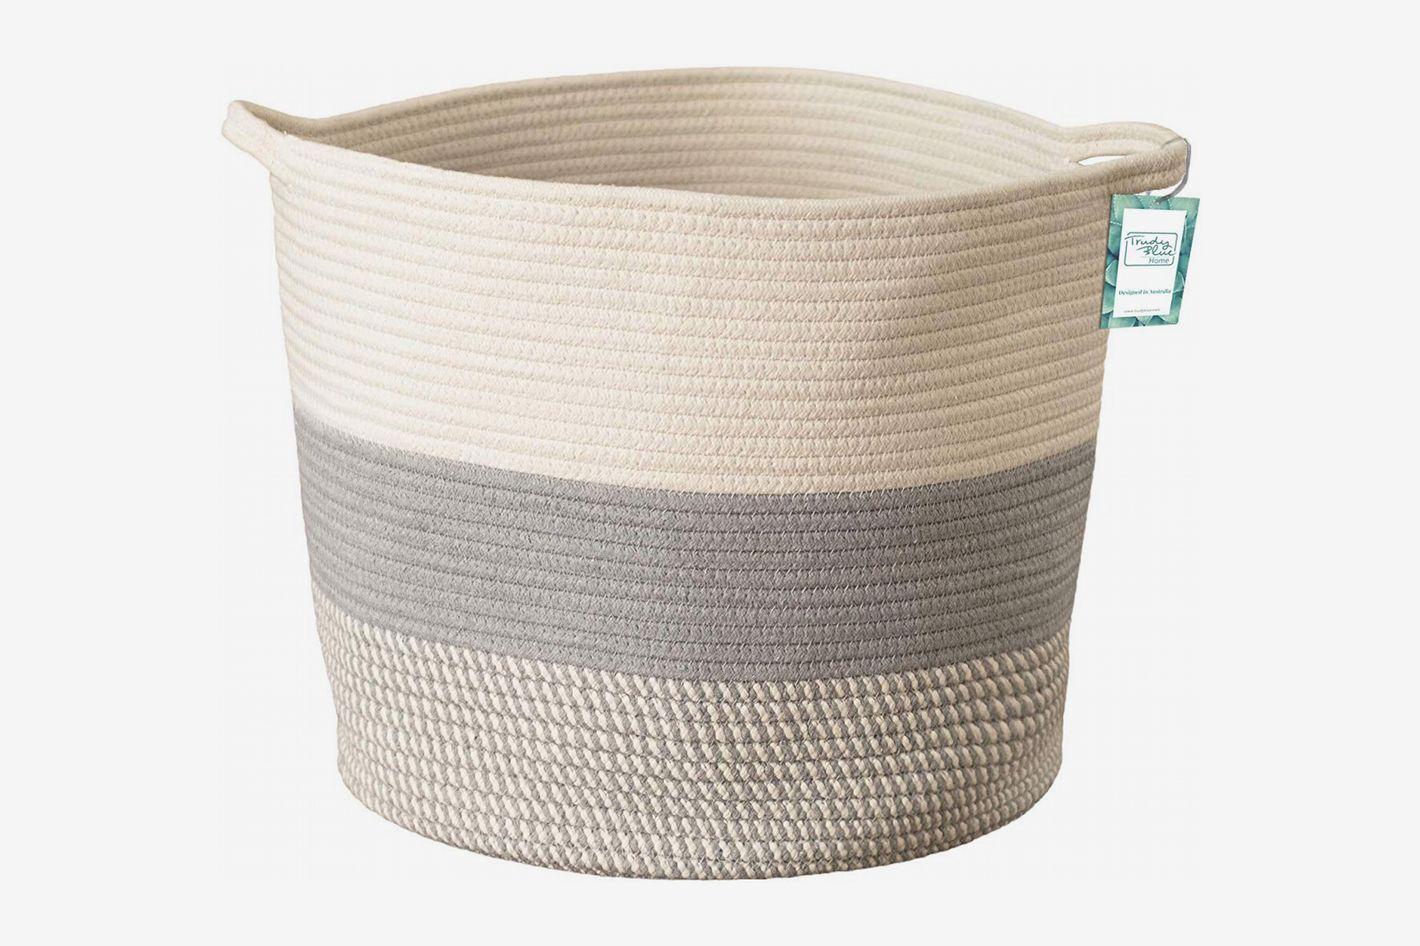 Extra Large Cotton Rope Woven Storage Basket